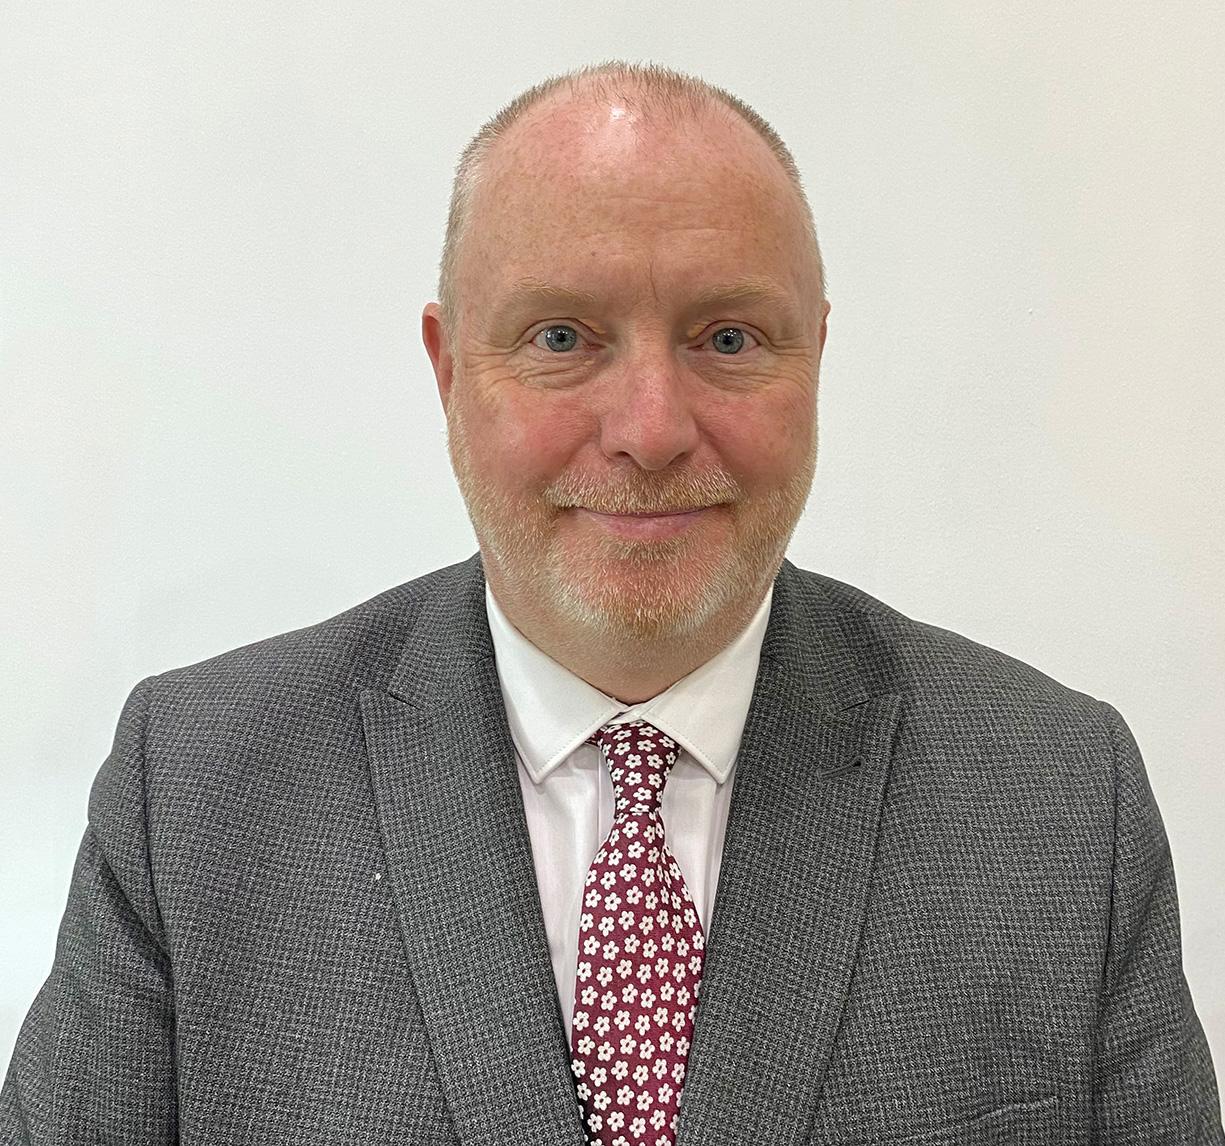 David Craig Evans